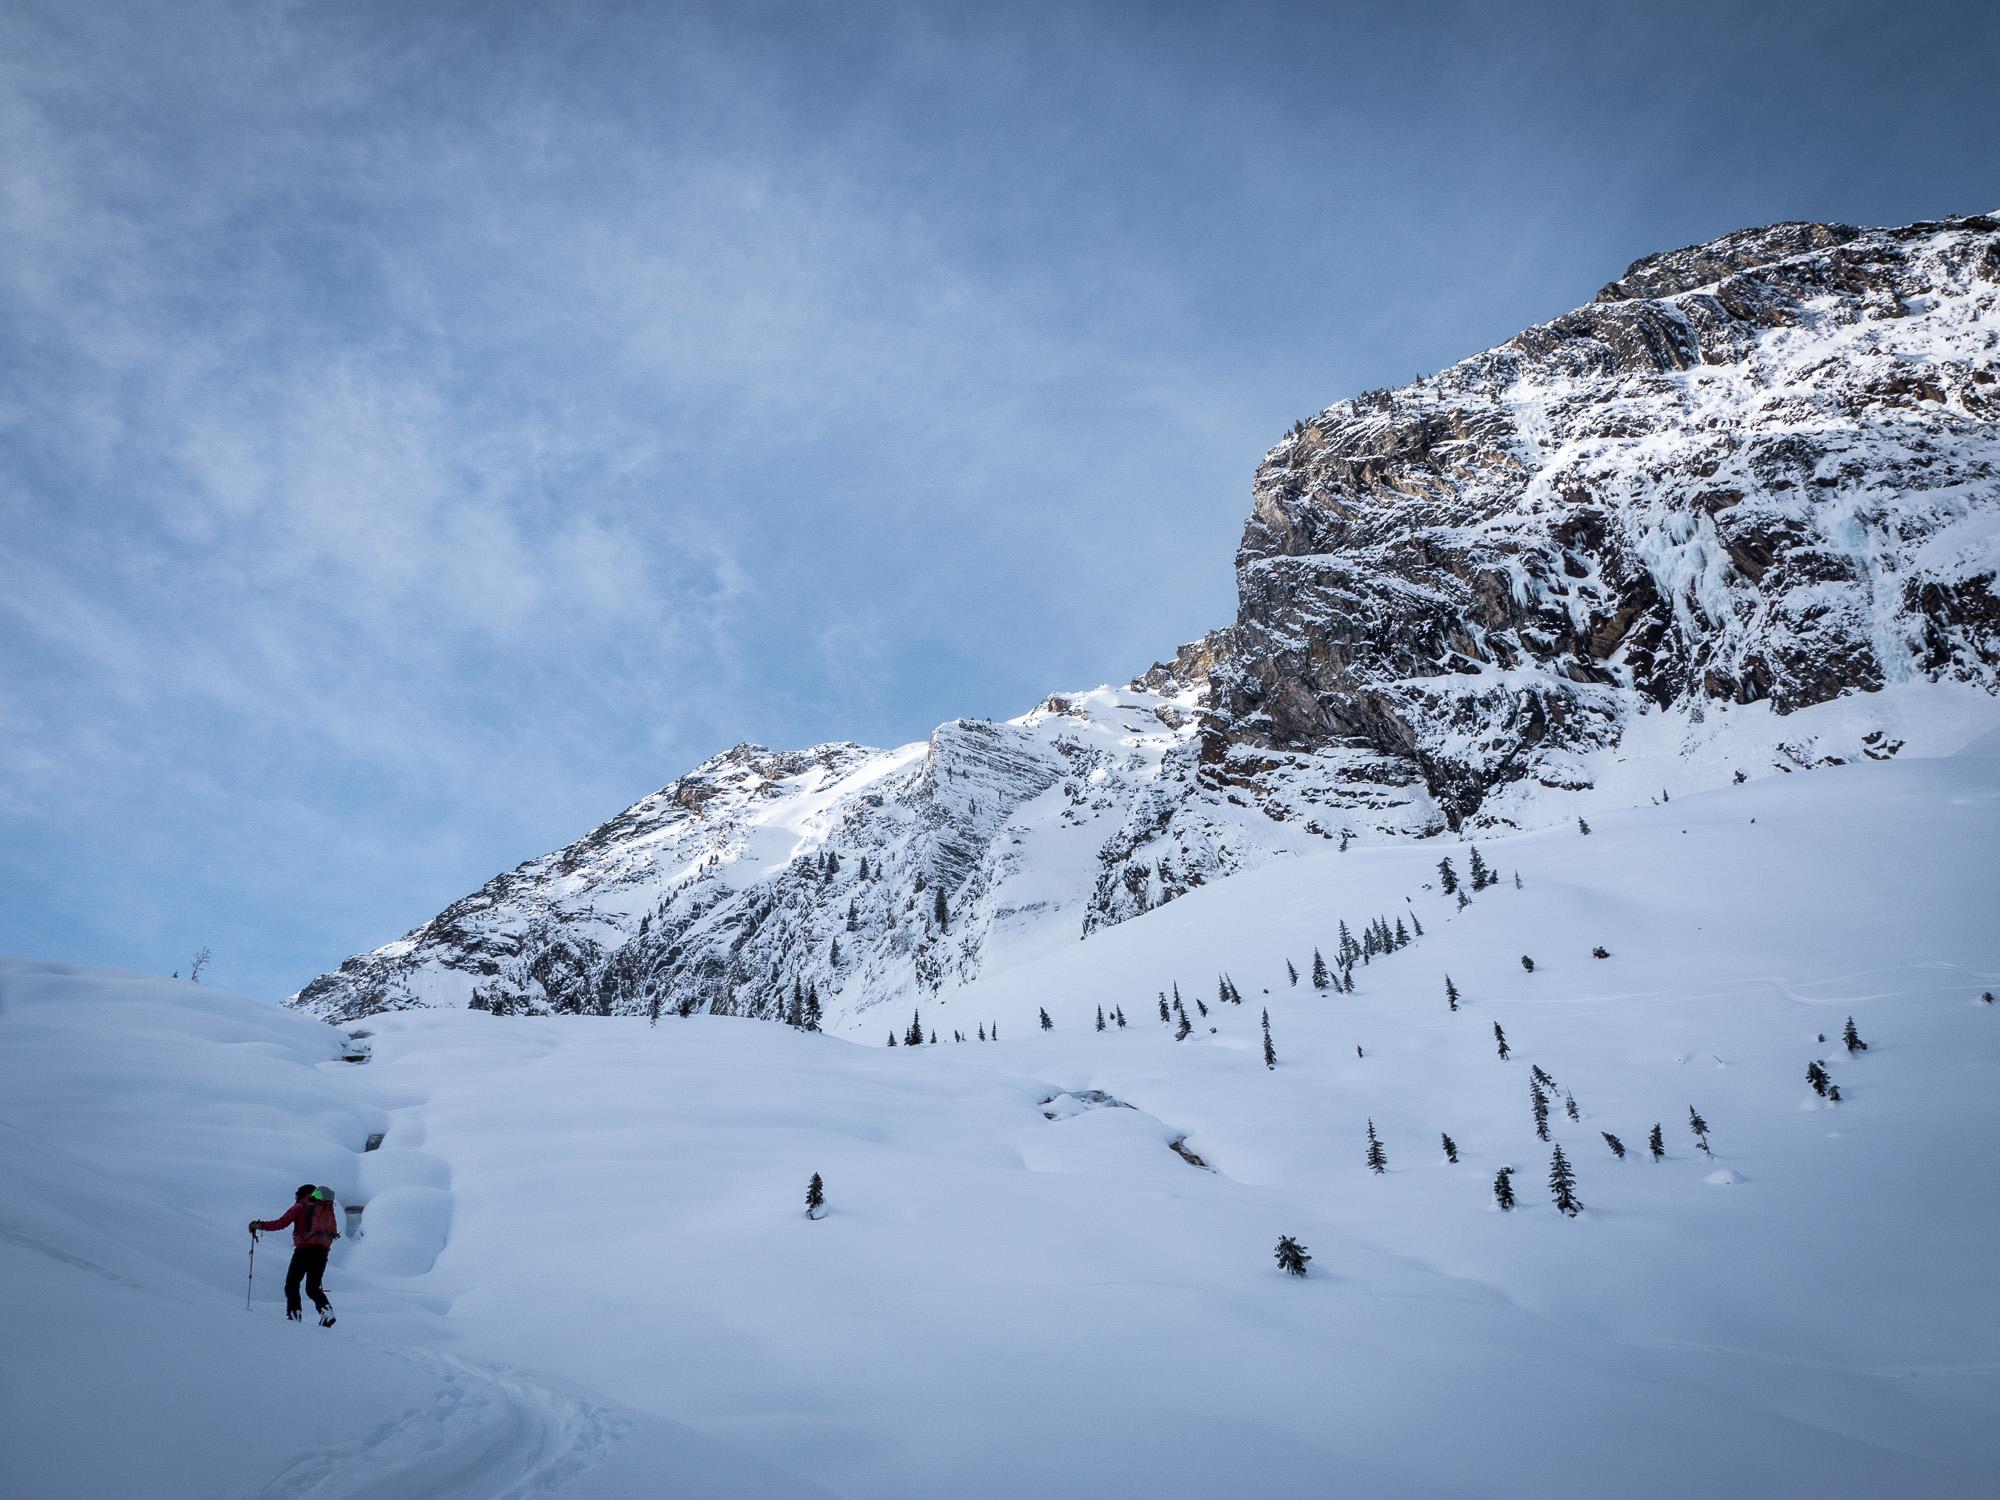 Maciej and the mountain